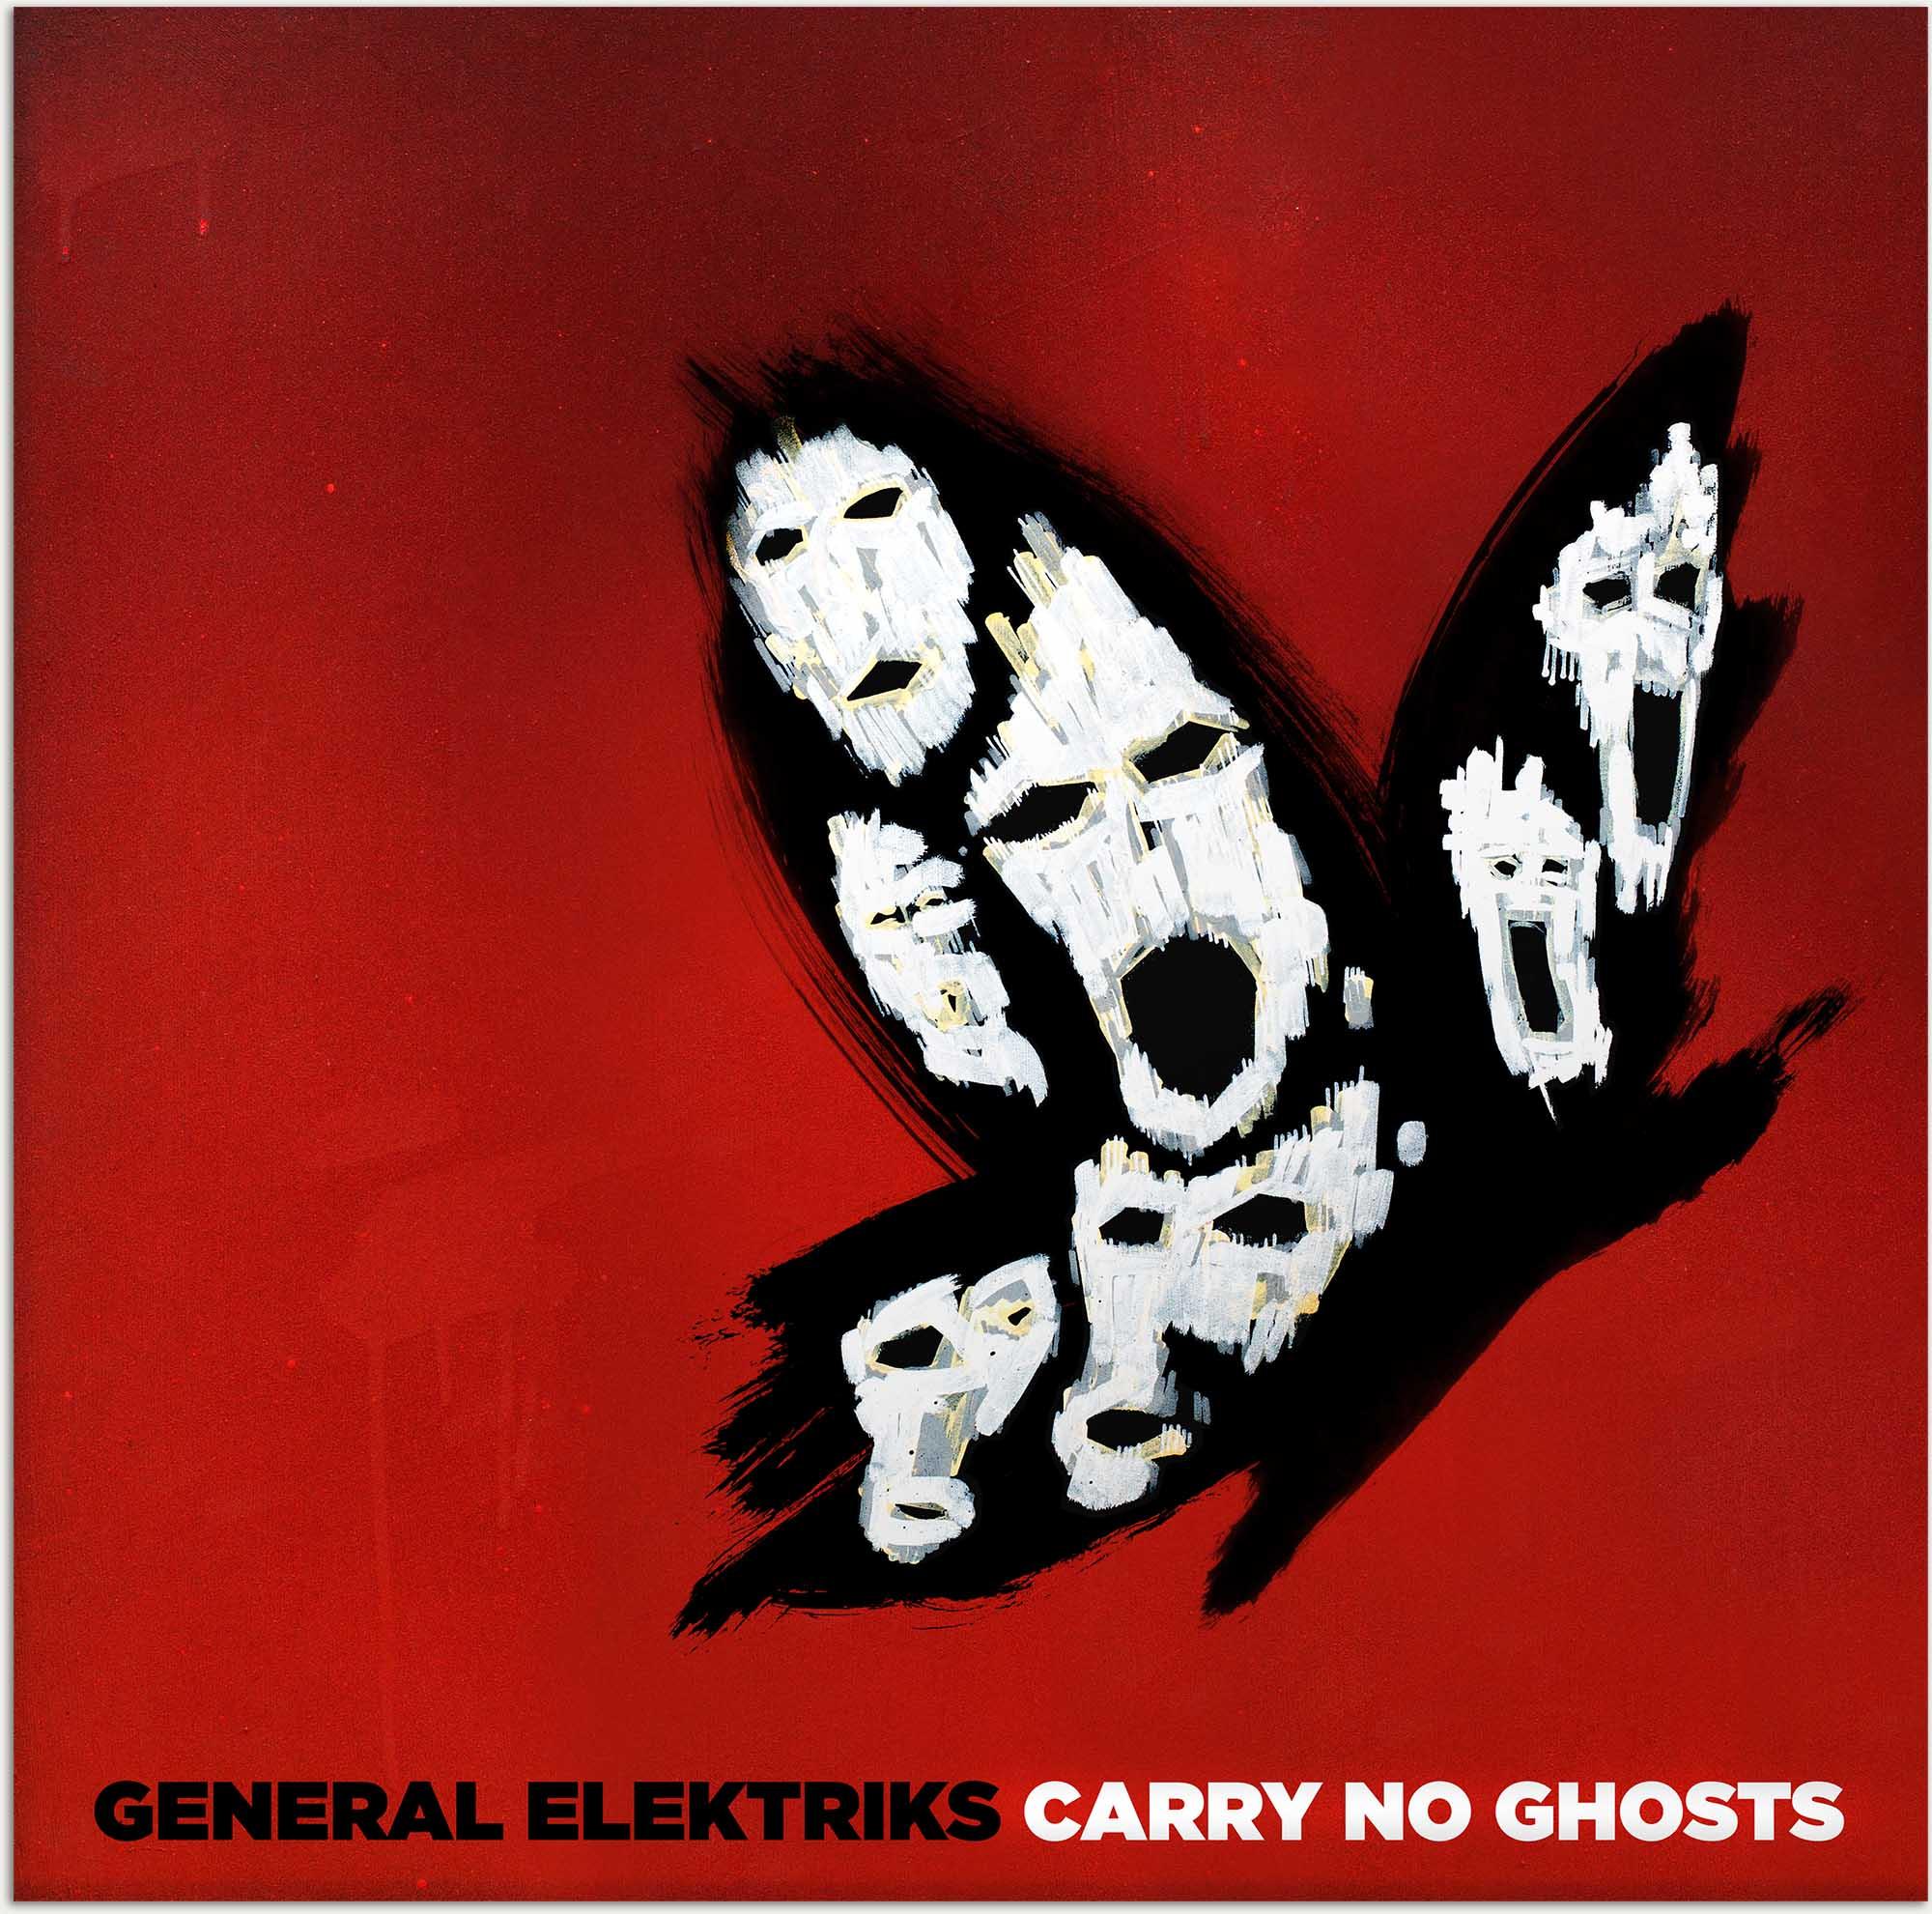 General Elektriks album cover design